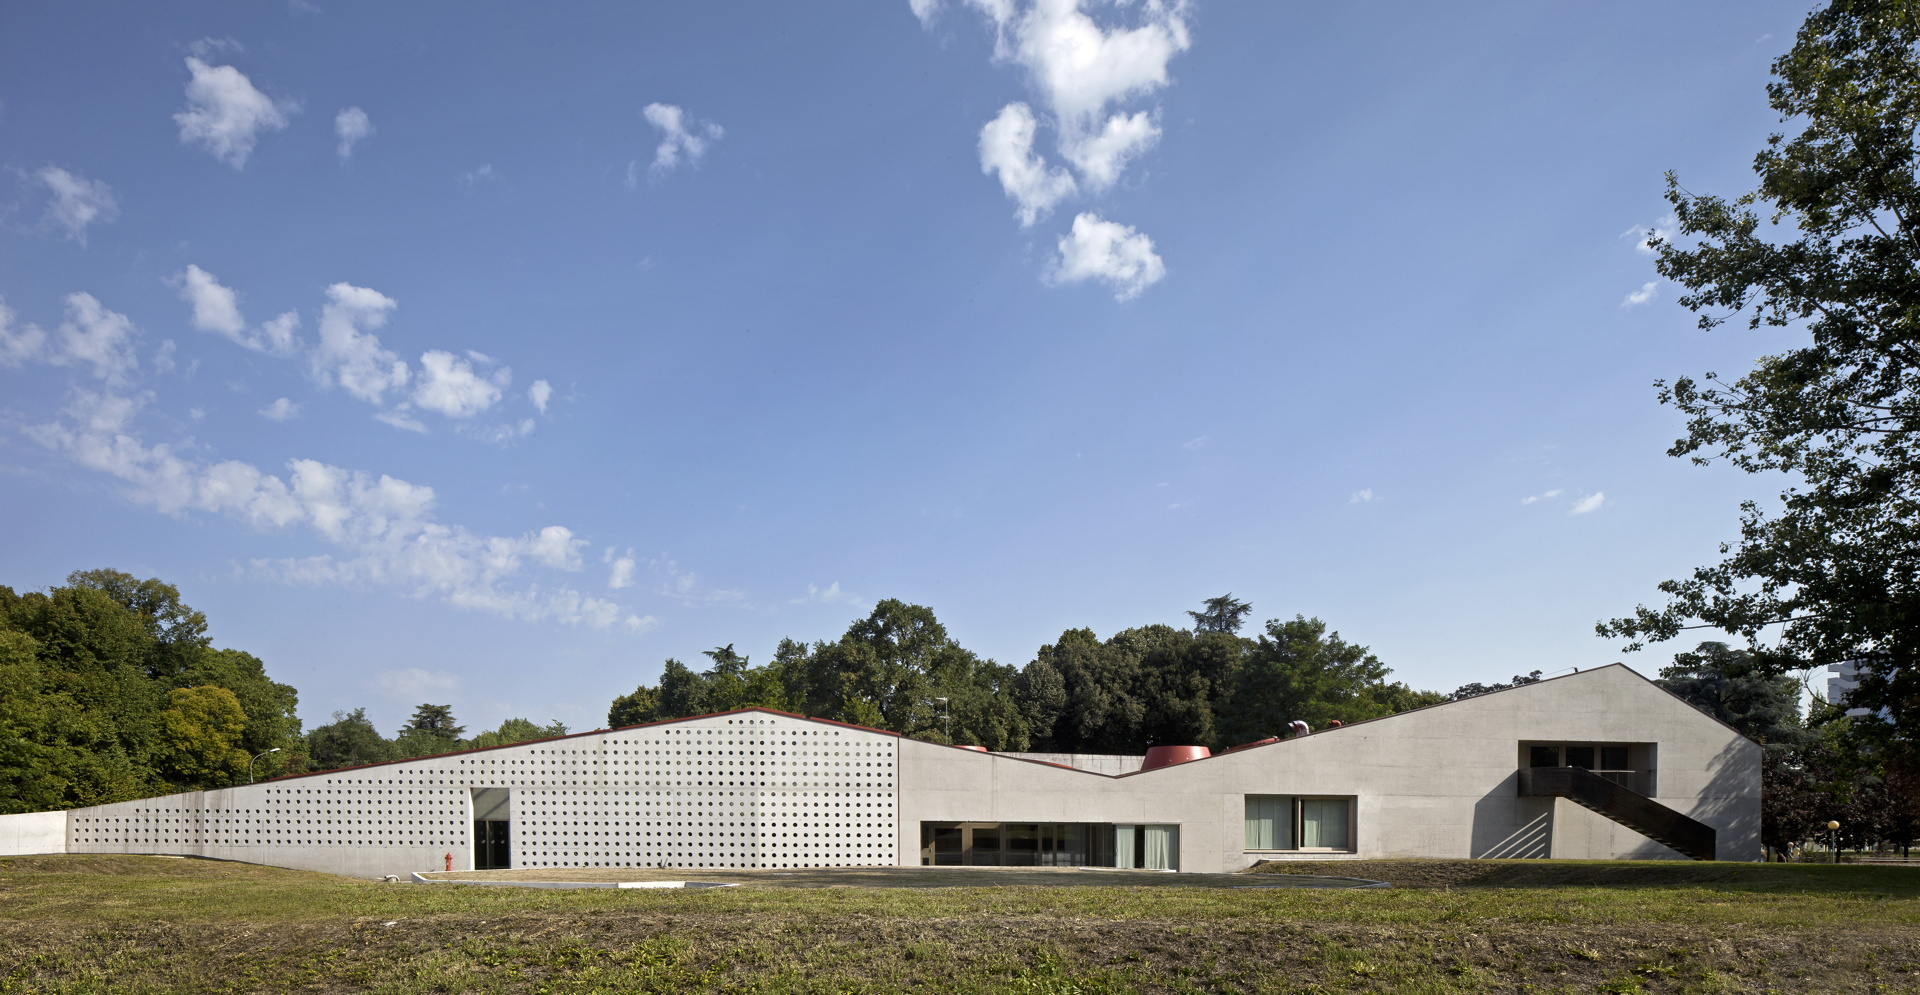 Davanzo Associati: Centro diurno Alzheimer a Castelfranco Veneto